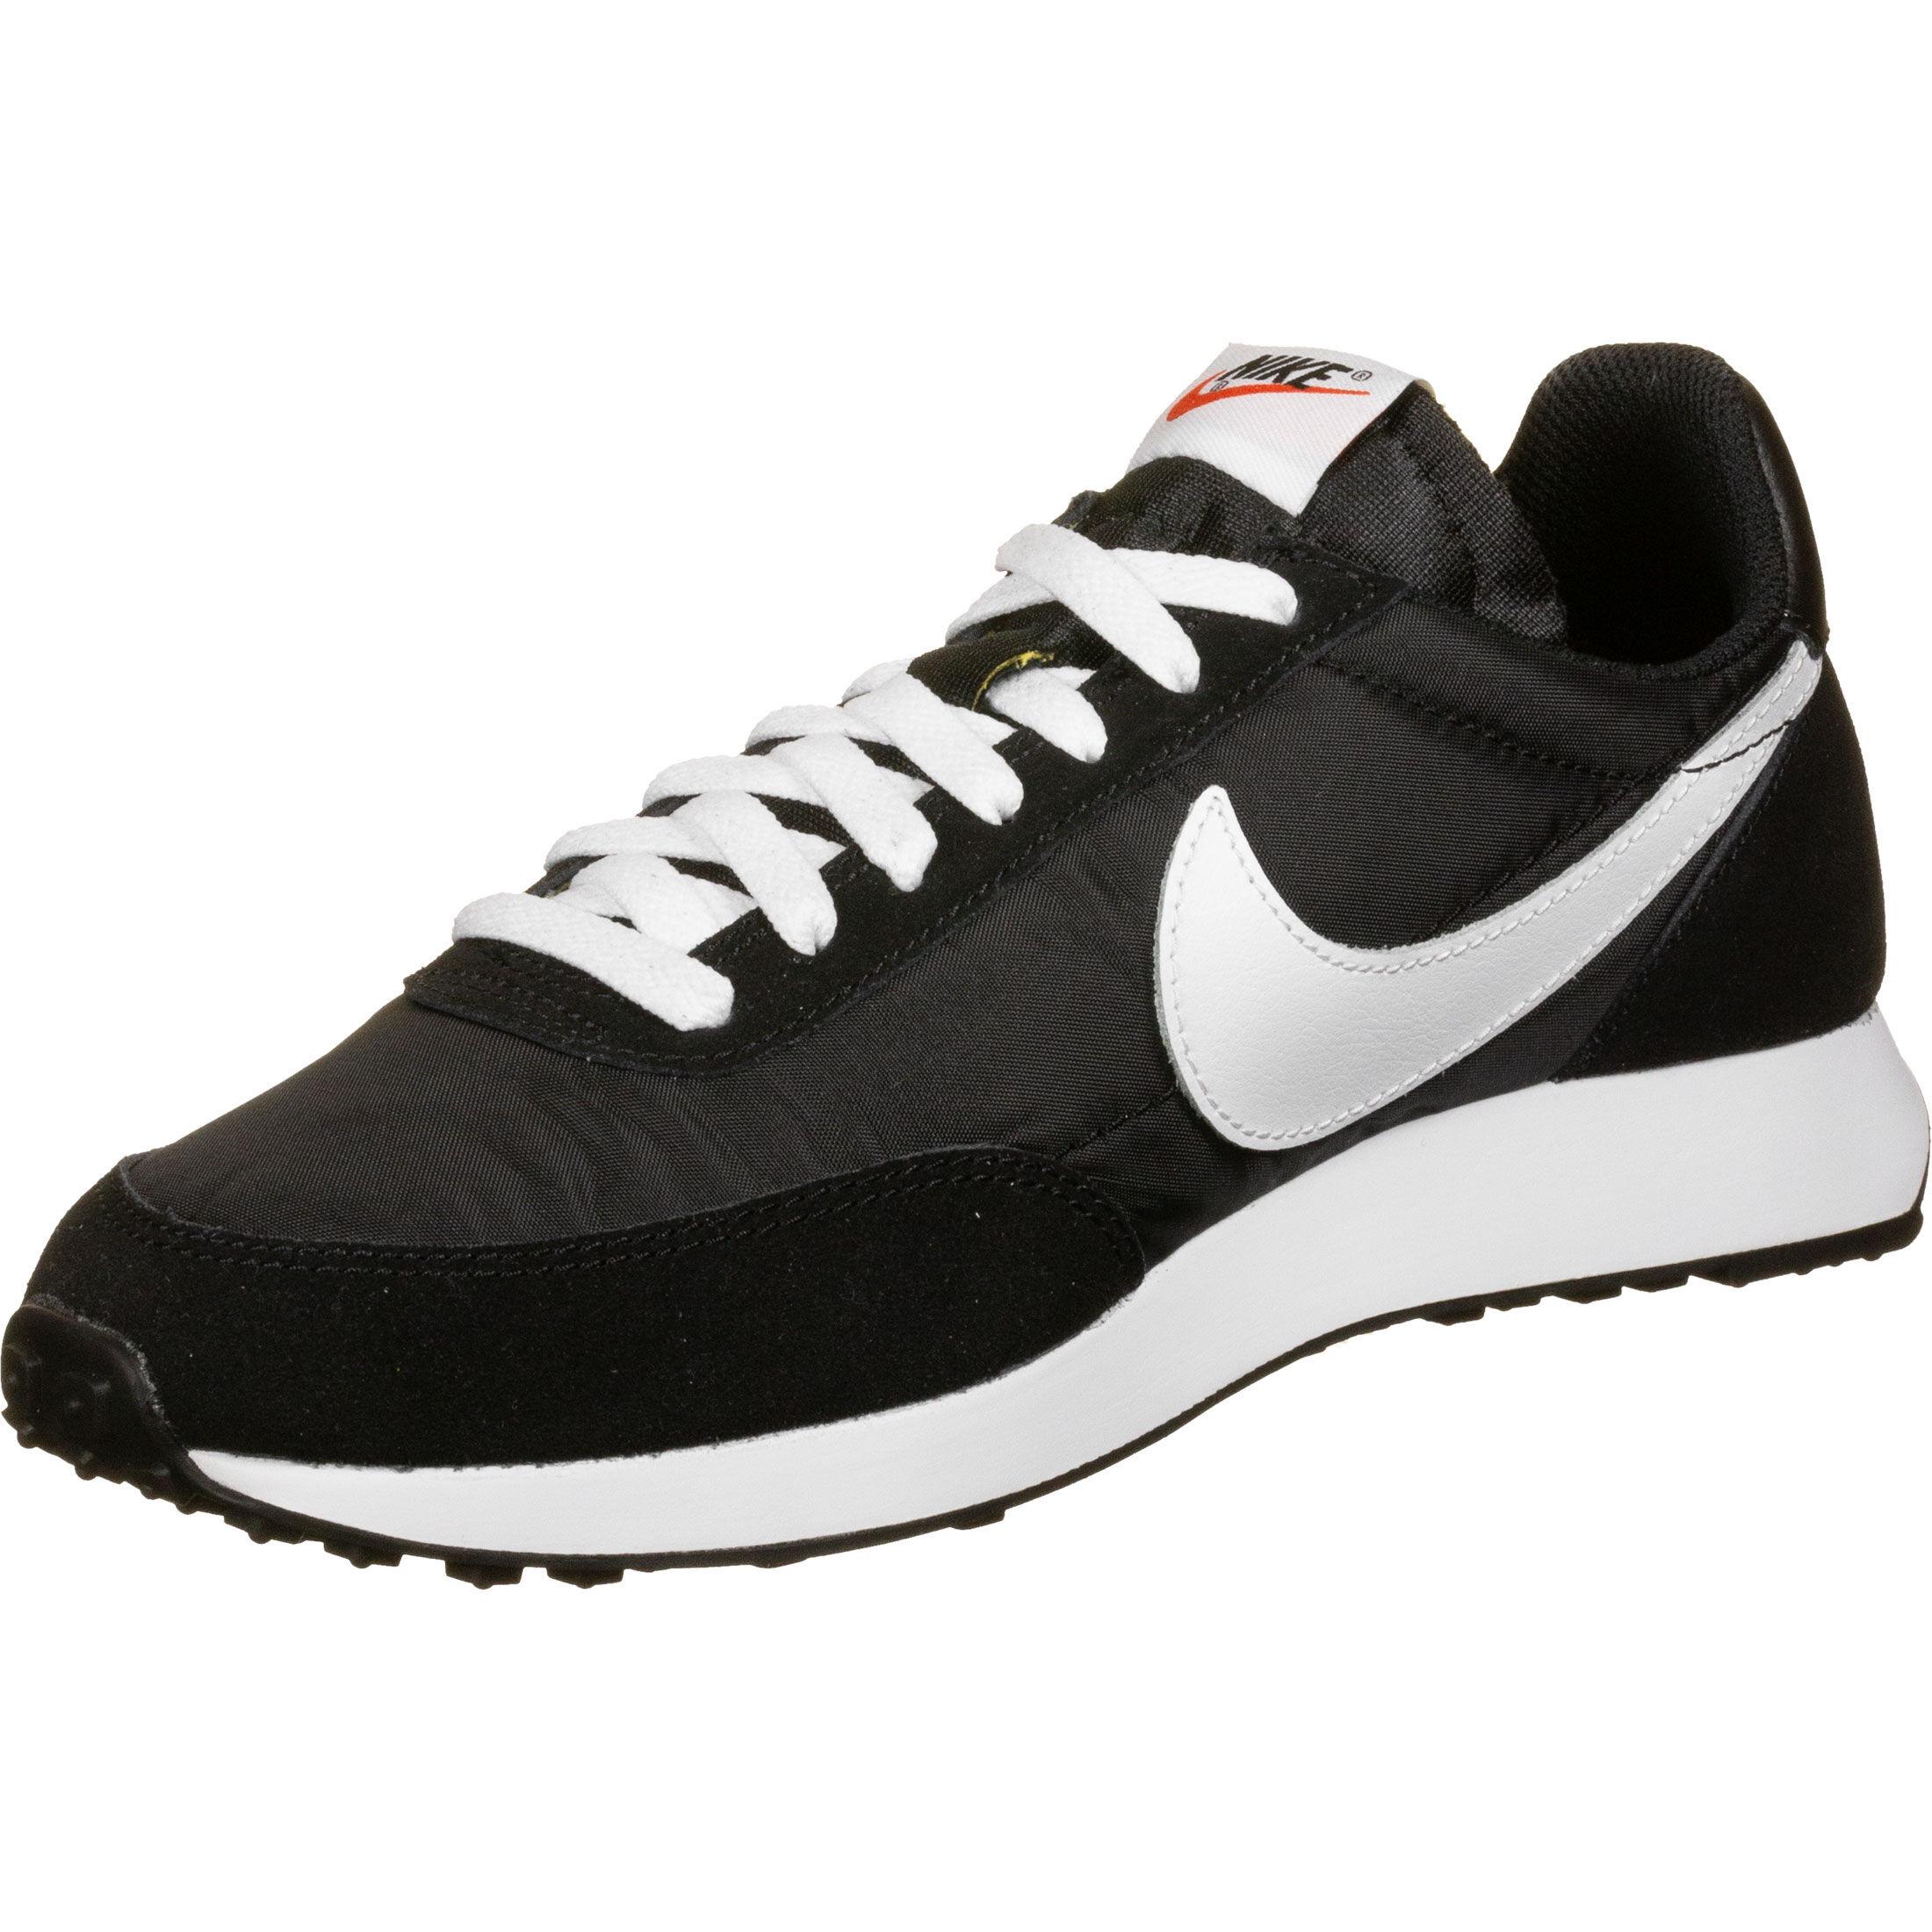 Nike Air Tailwind 79, 47.5 EU, homme, noir